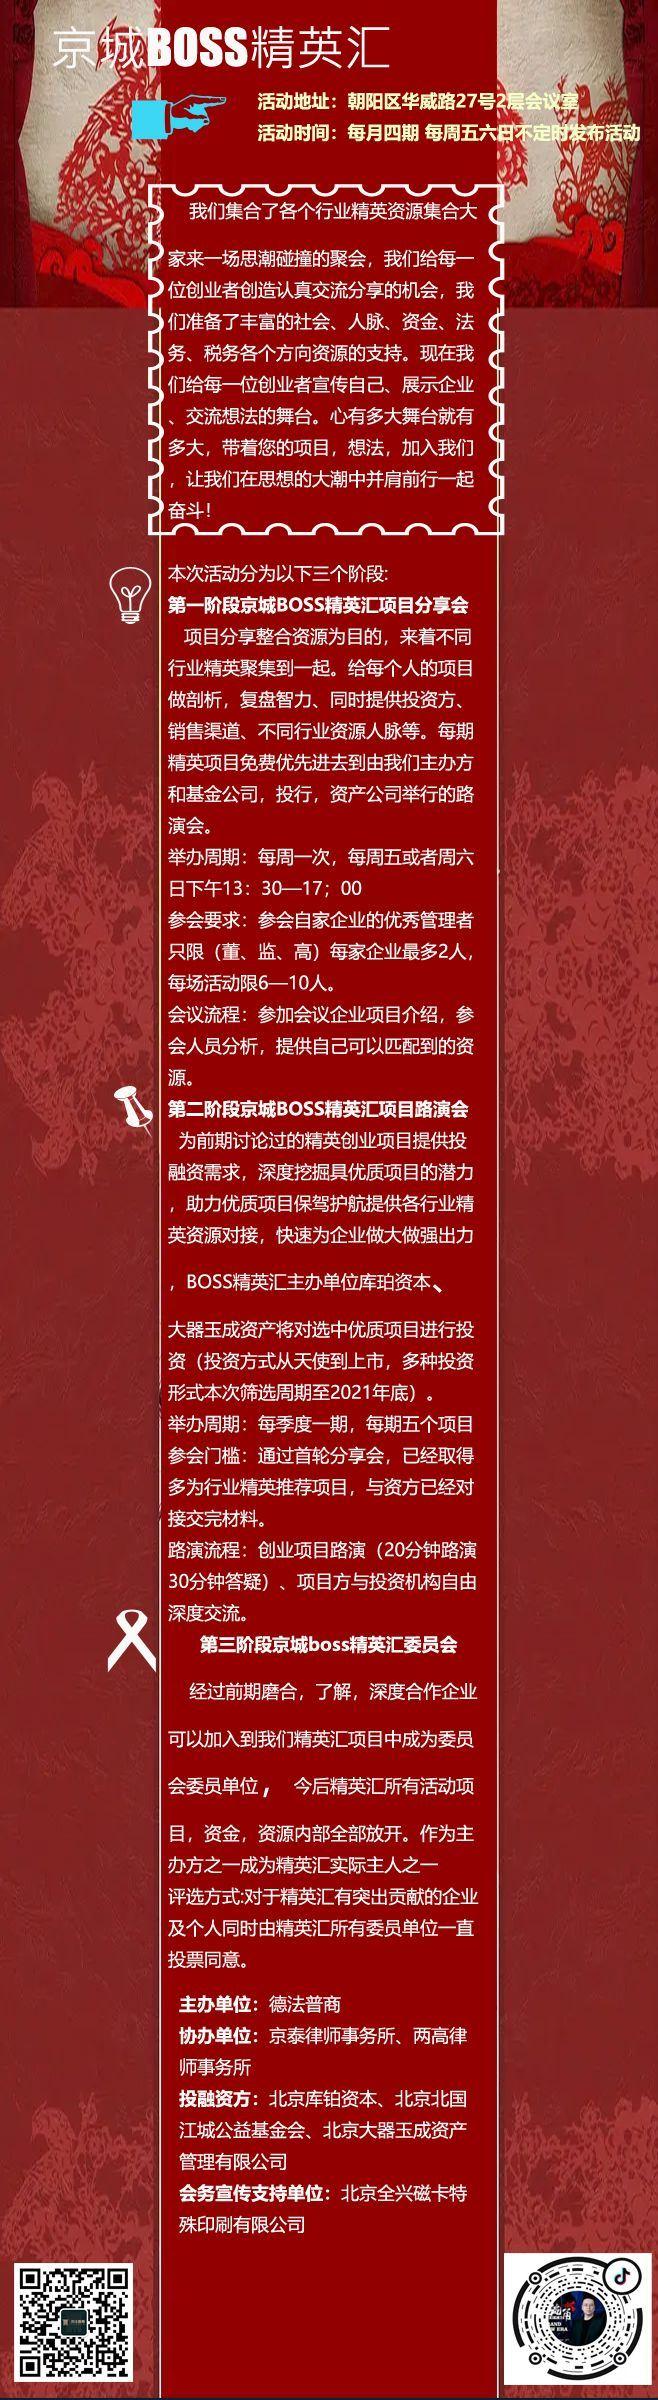 http://www.huodongxing.com/file/20210527/1564164545707/784165906956376.jpg